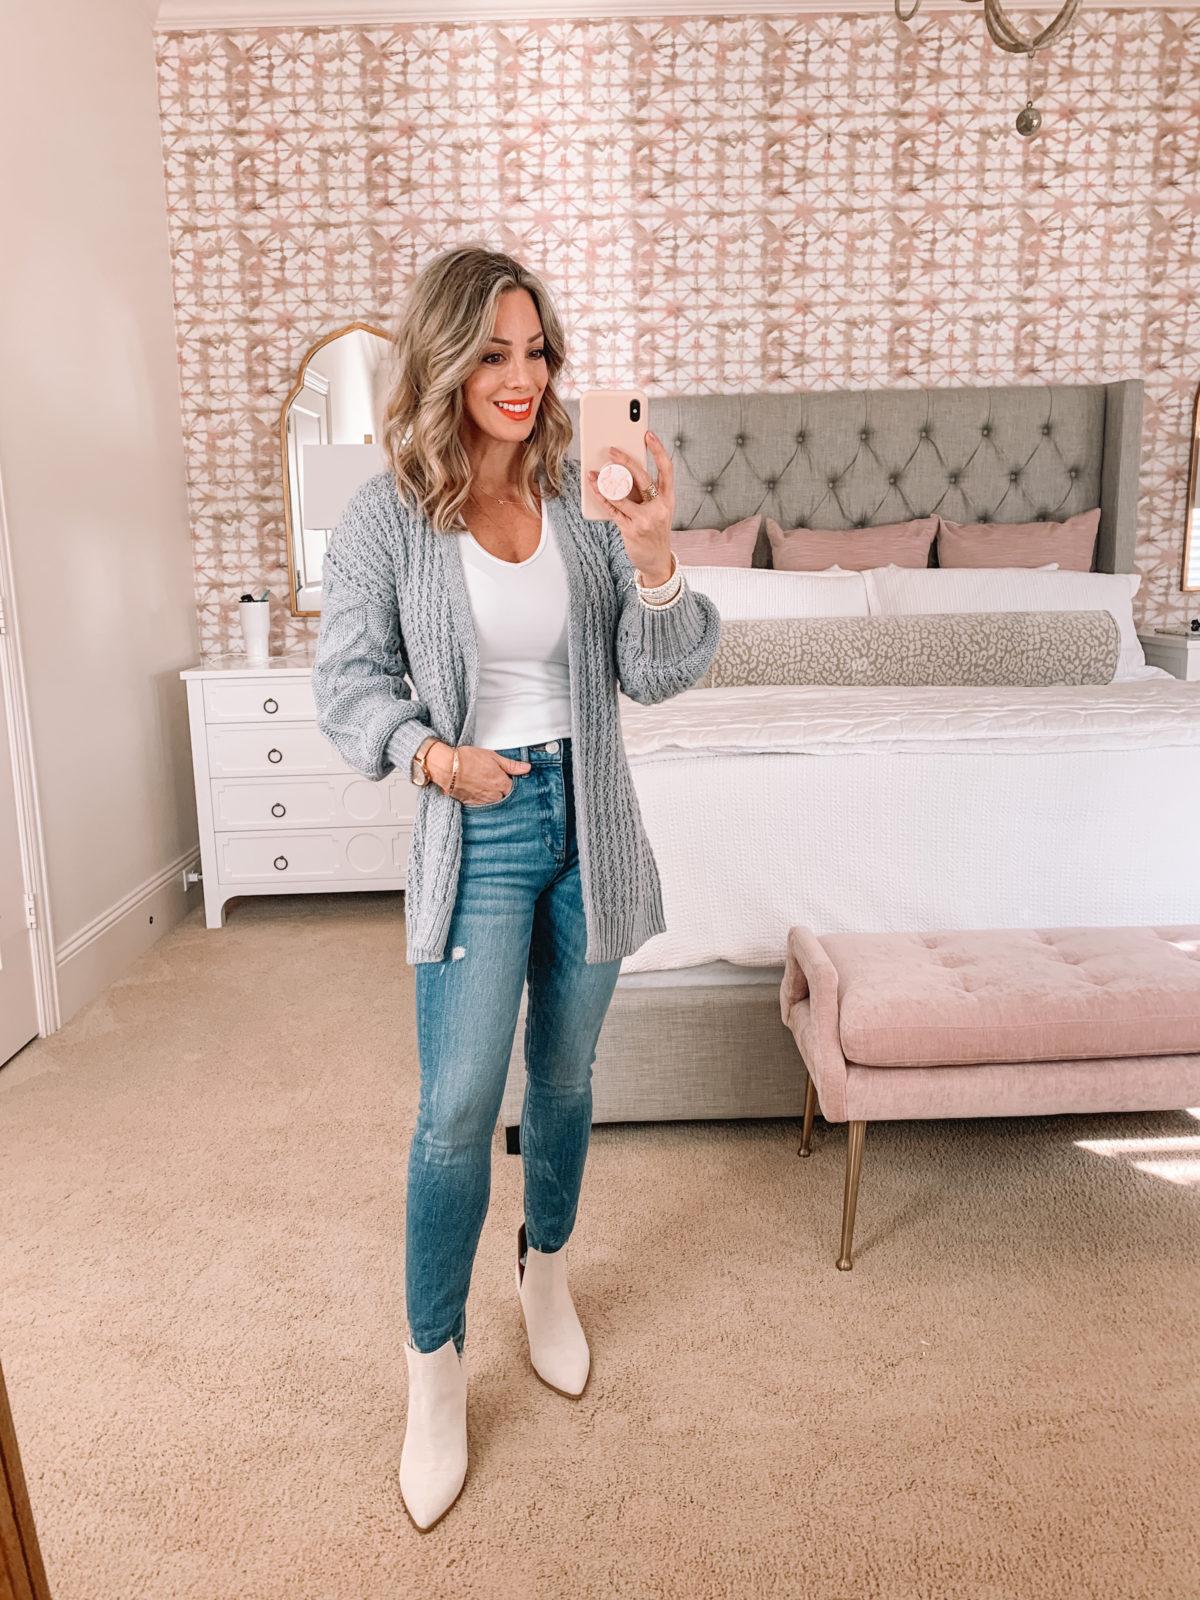 Dressing Room Try On Abercrombie, Target, LOFT, Jeans, Cardigan, Tee, Booties